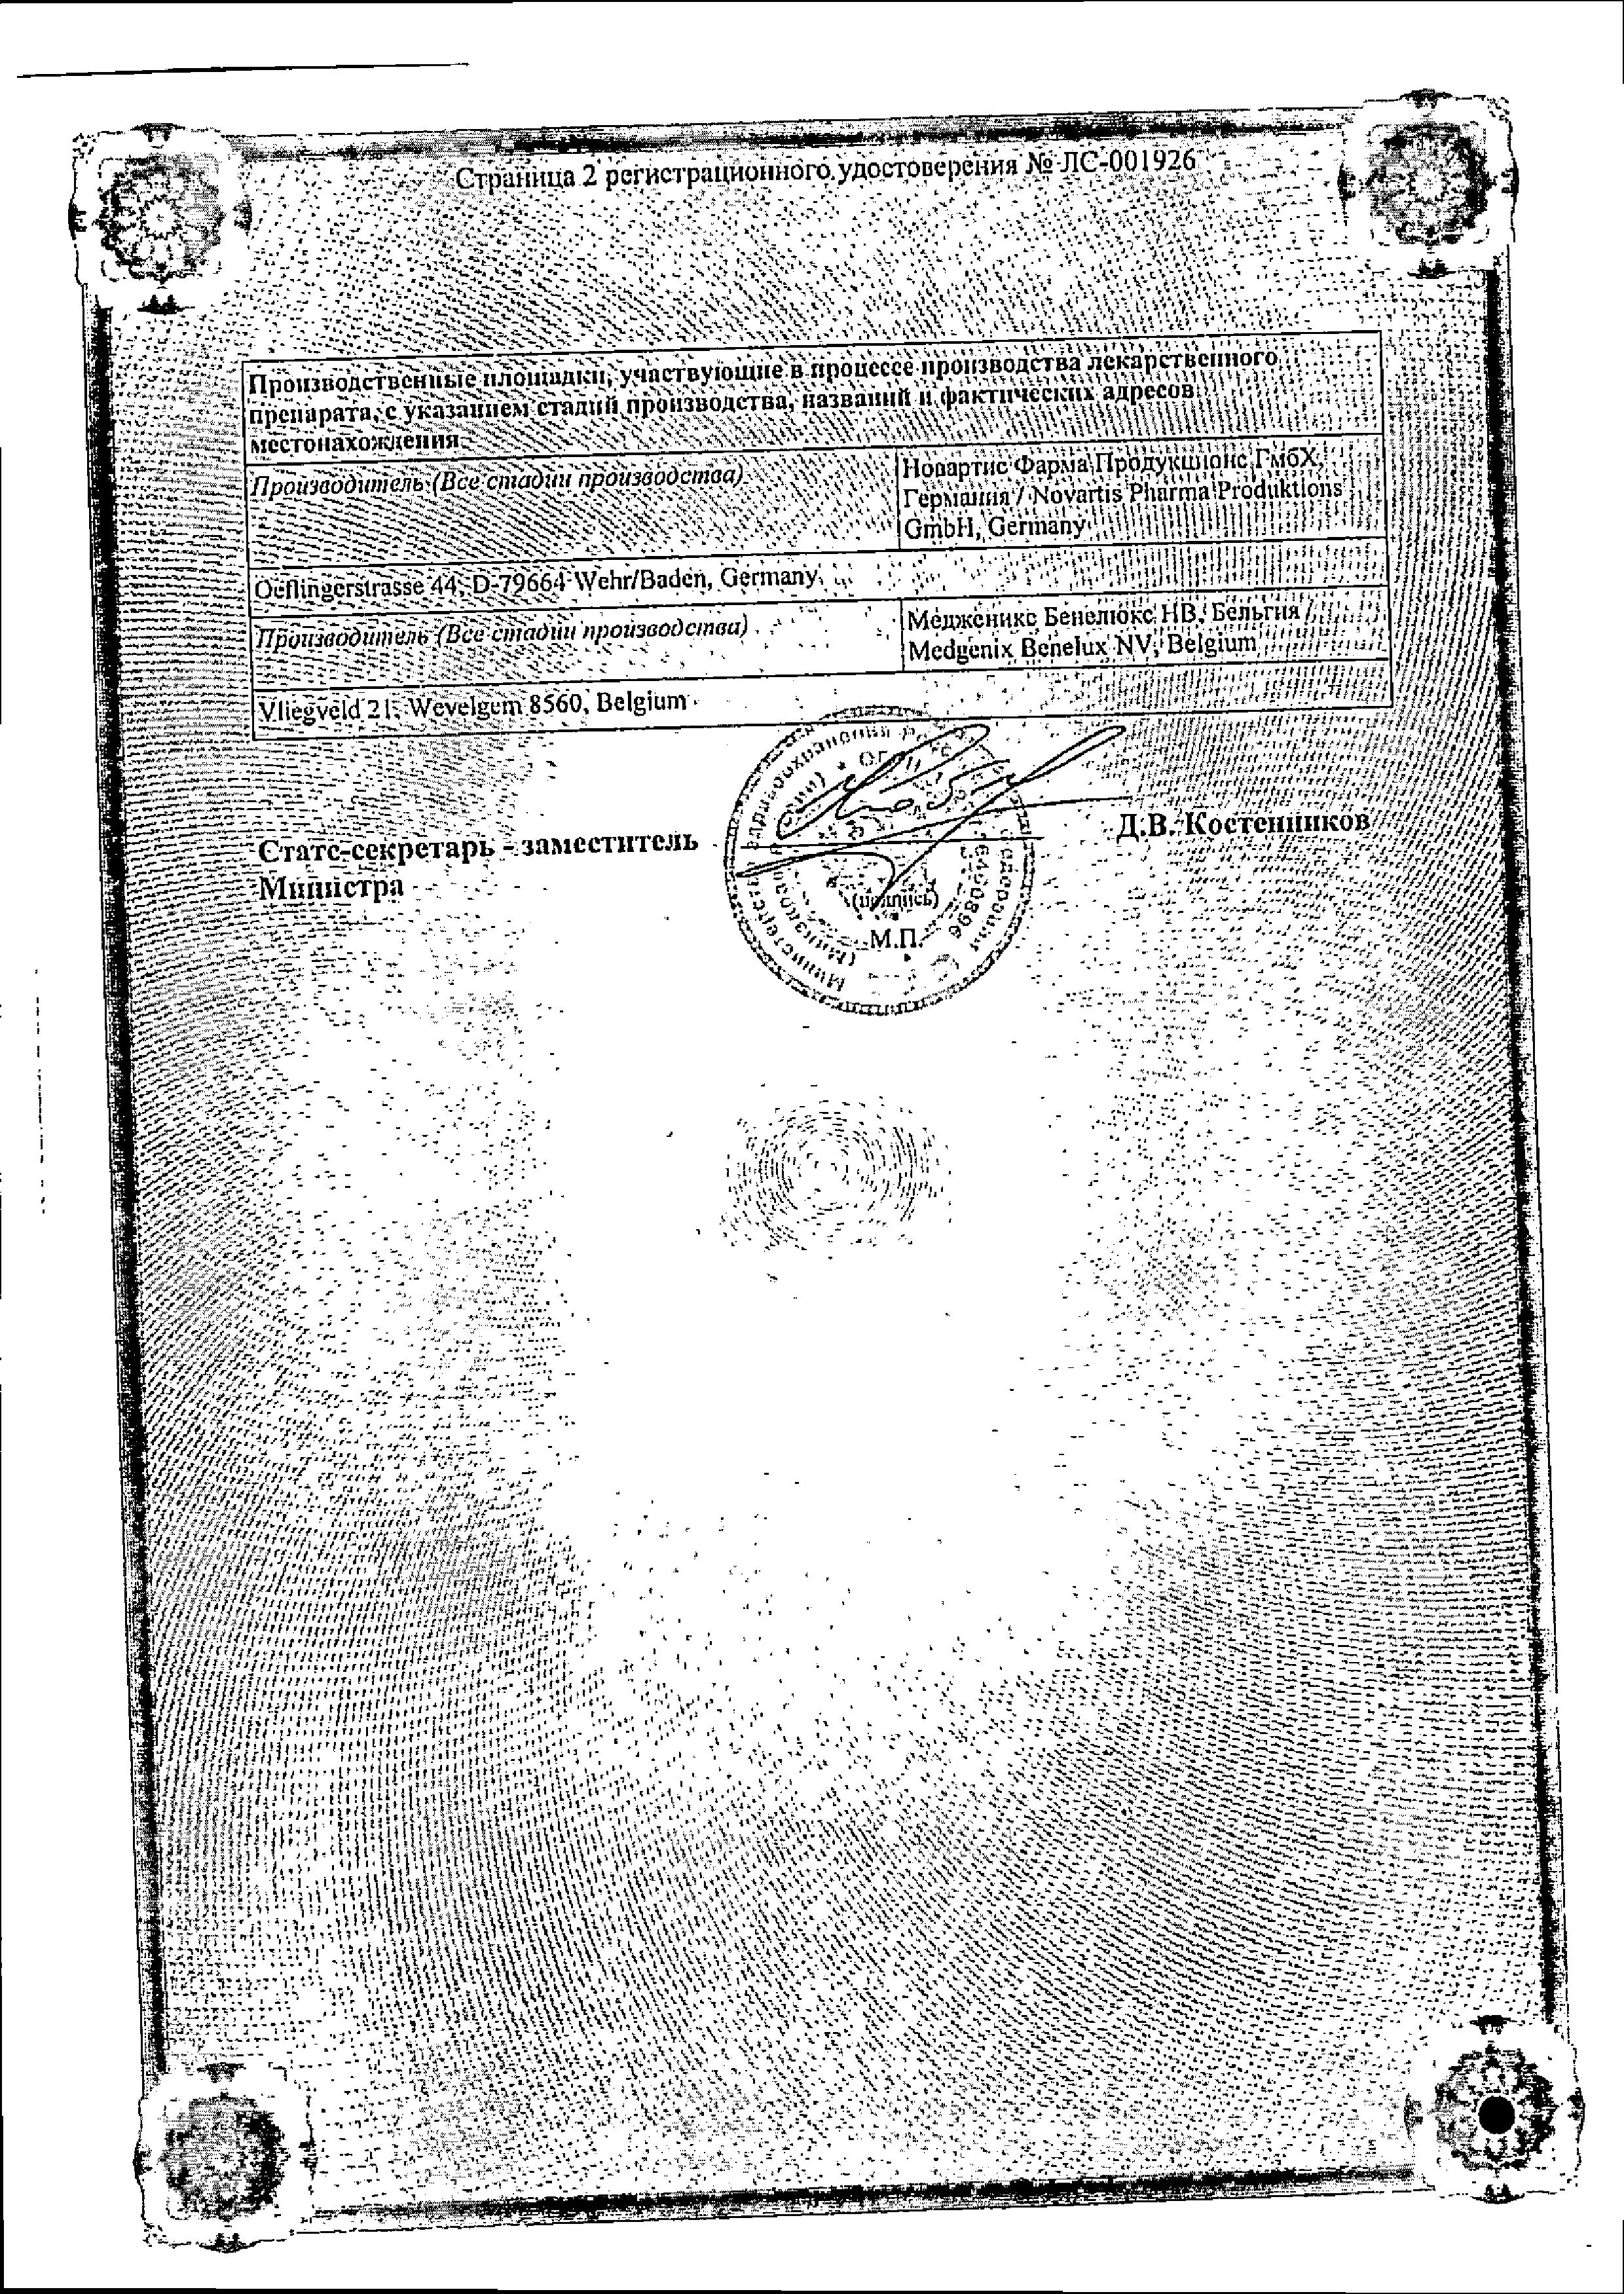 Фенистил